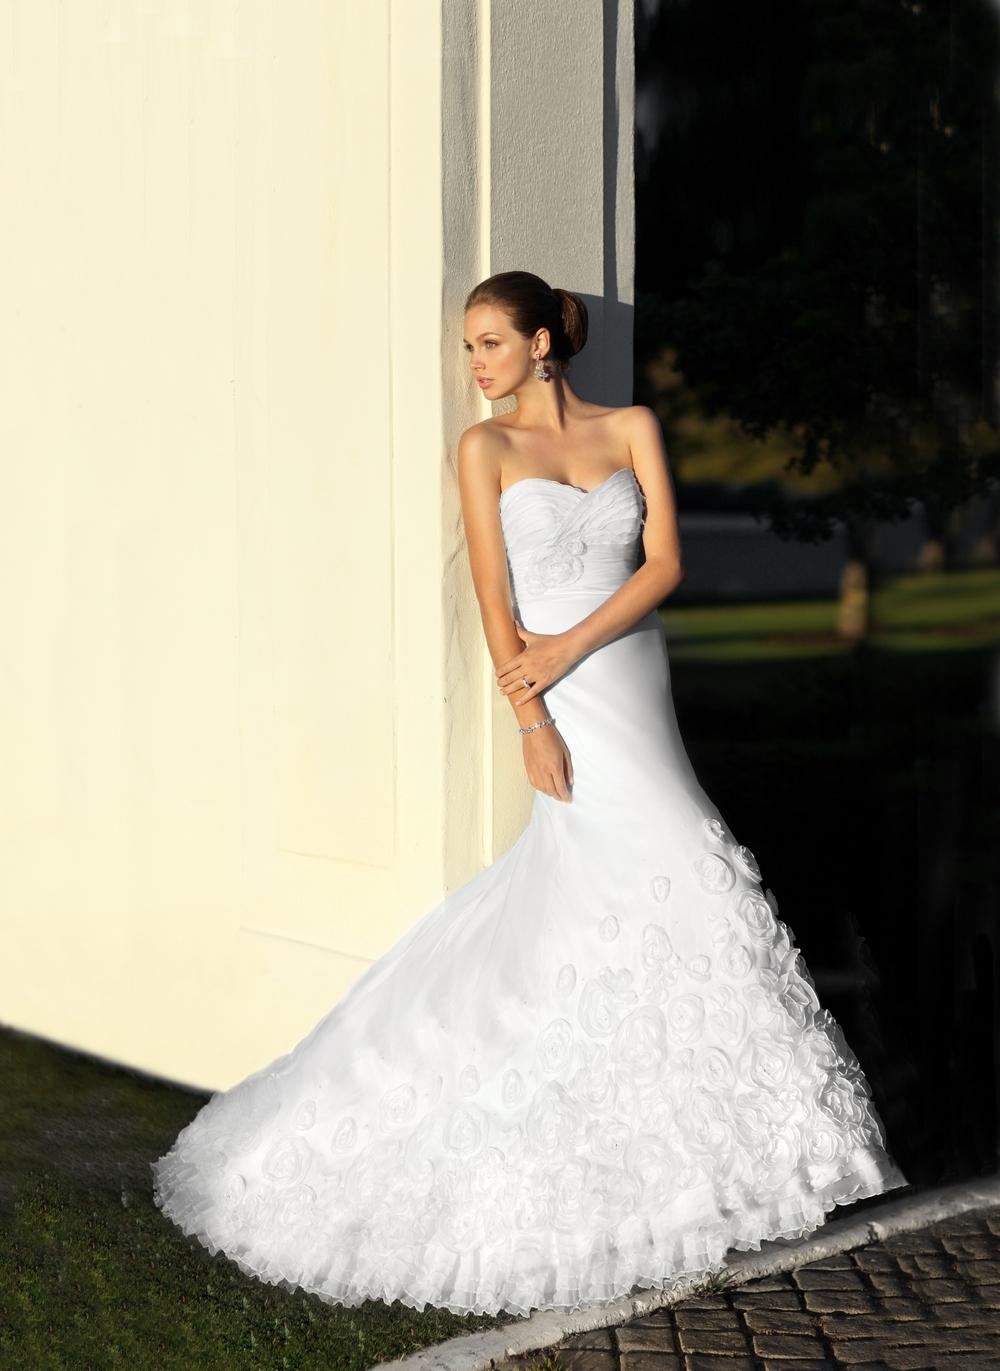 Essense-of-australia-wedding-dresses-2010-2011-d1073-side.full